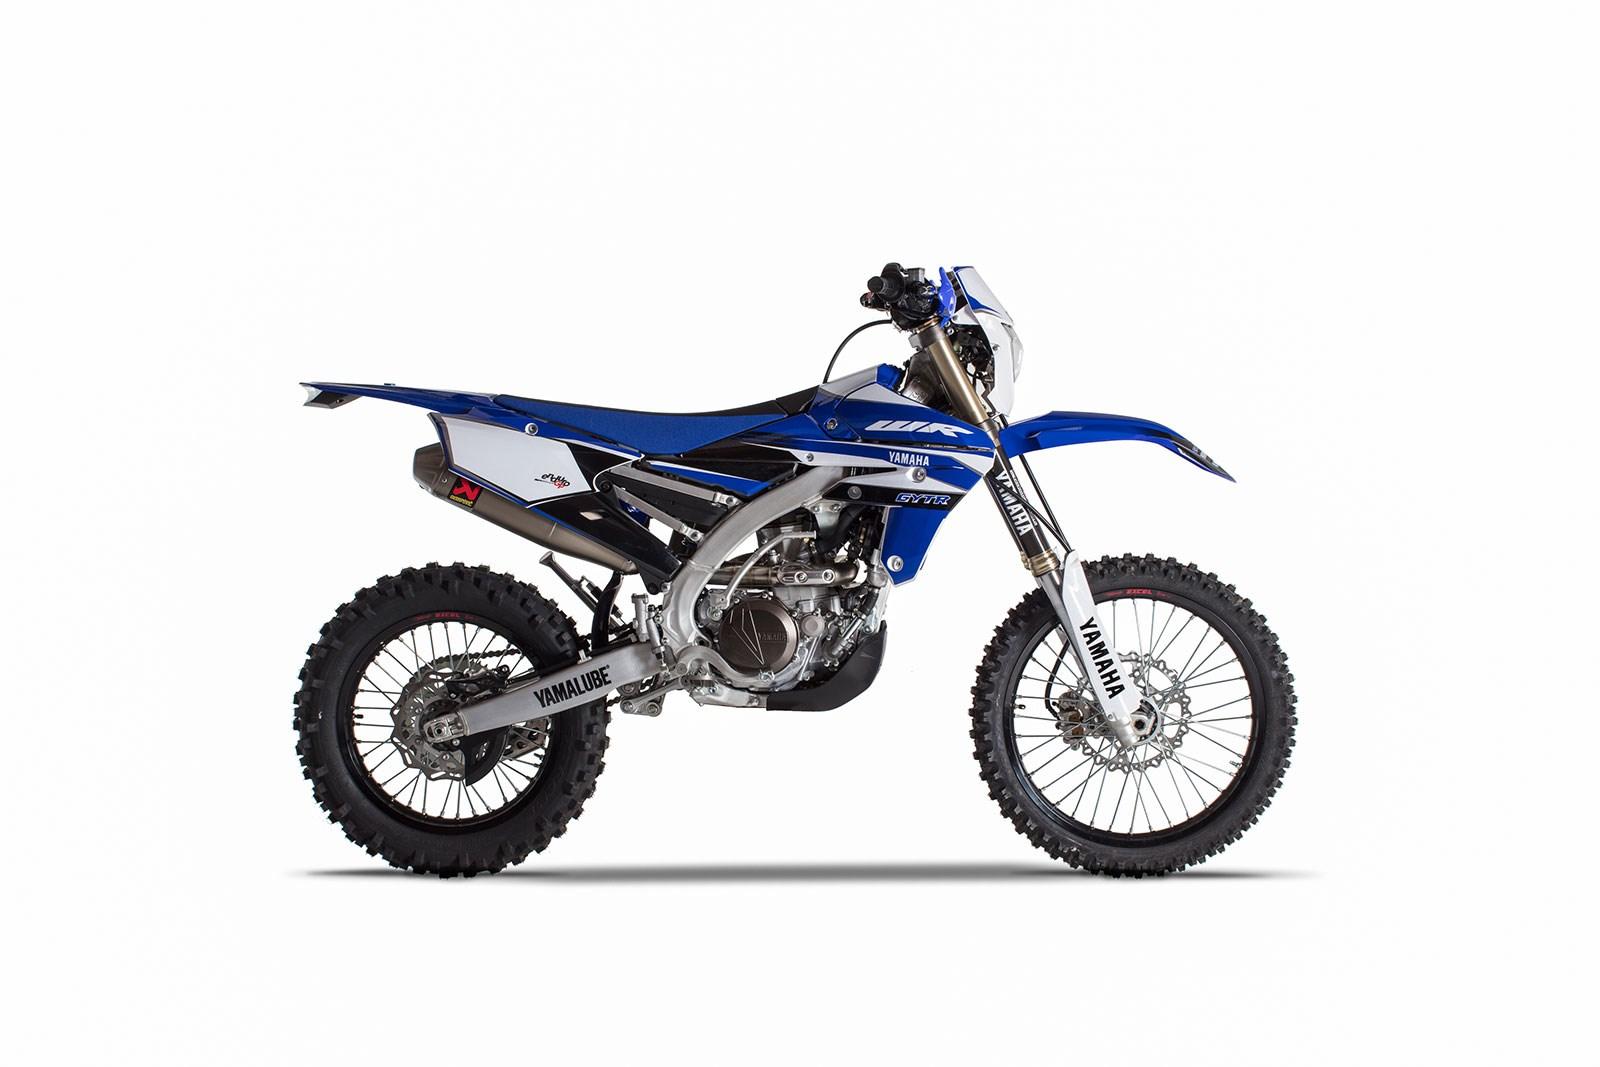 Yamaha announce limited edition EnduroGP models